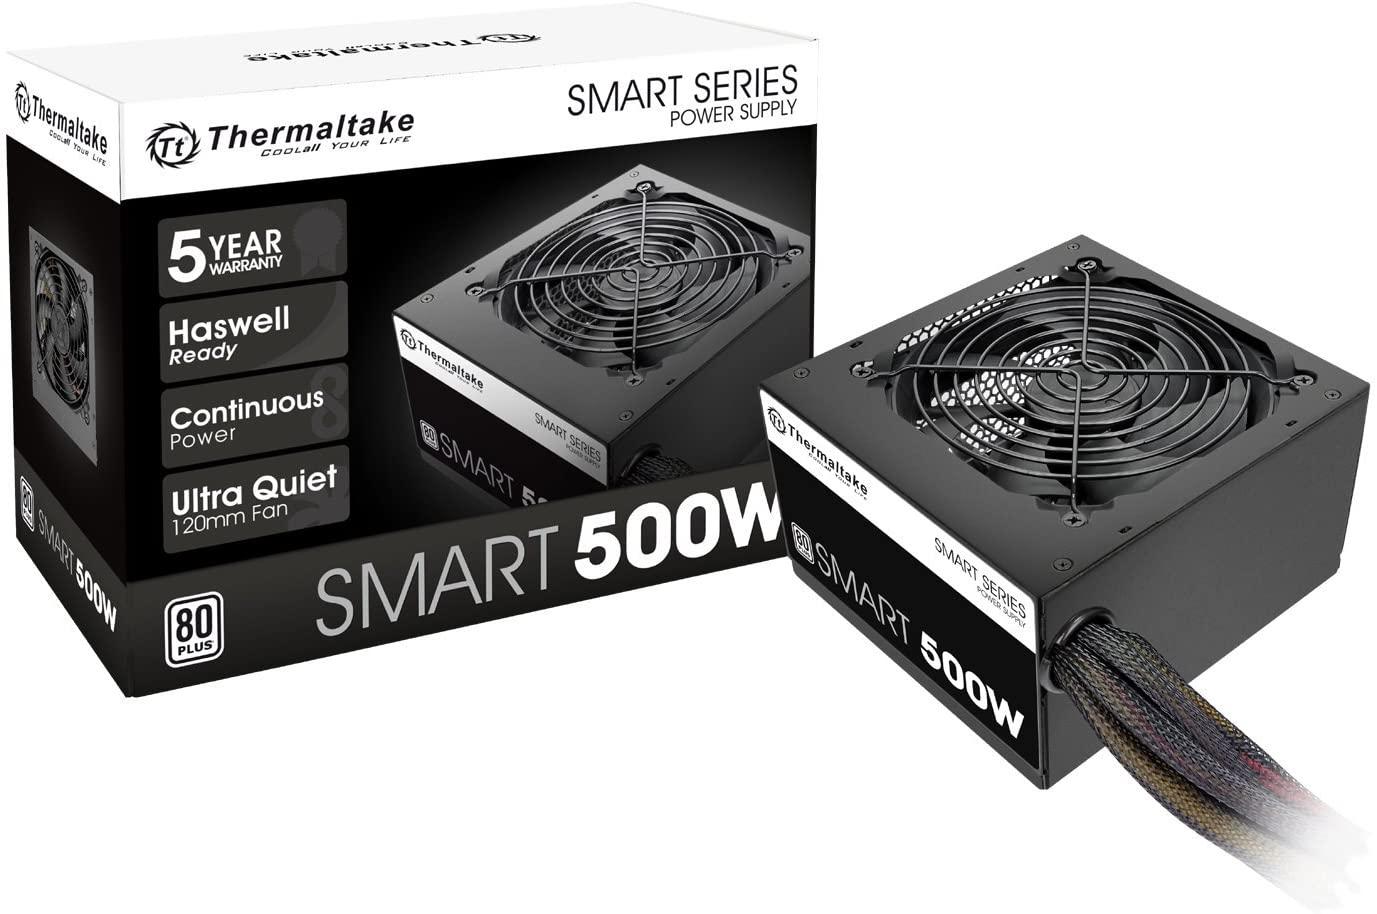 Thermaltake 500W (White) Power Supply PSU / 5-year warranty - $44.99